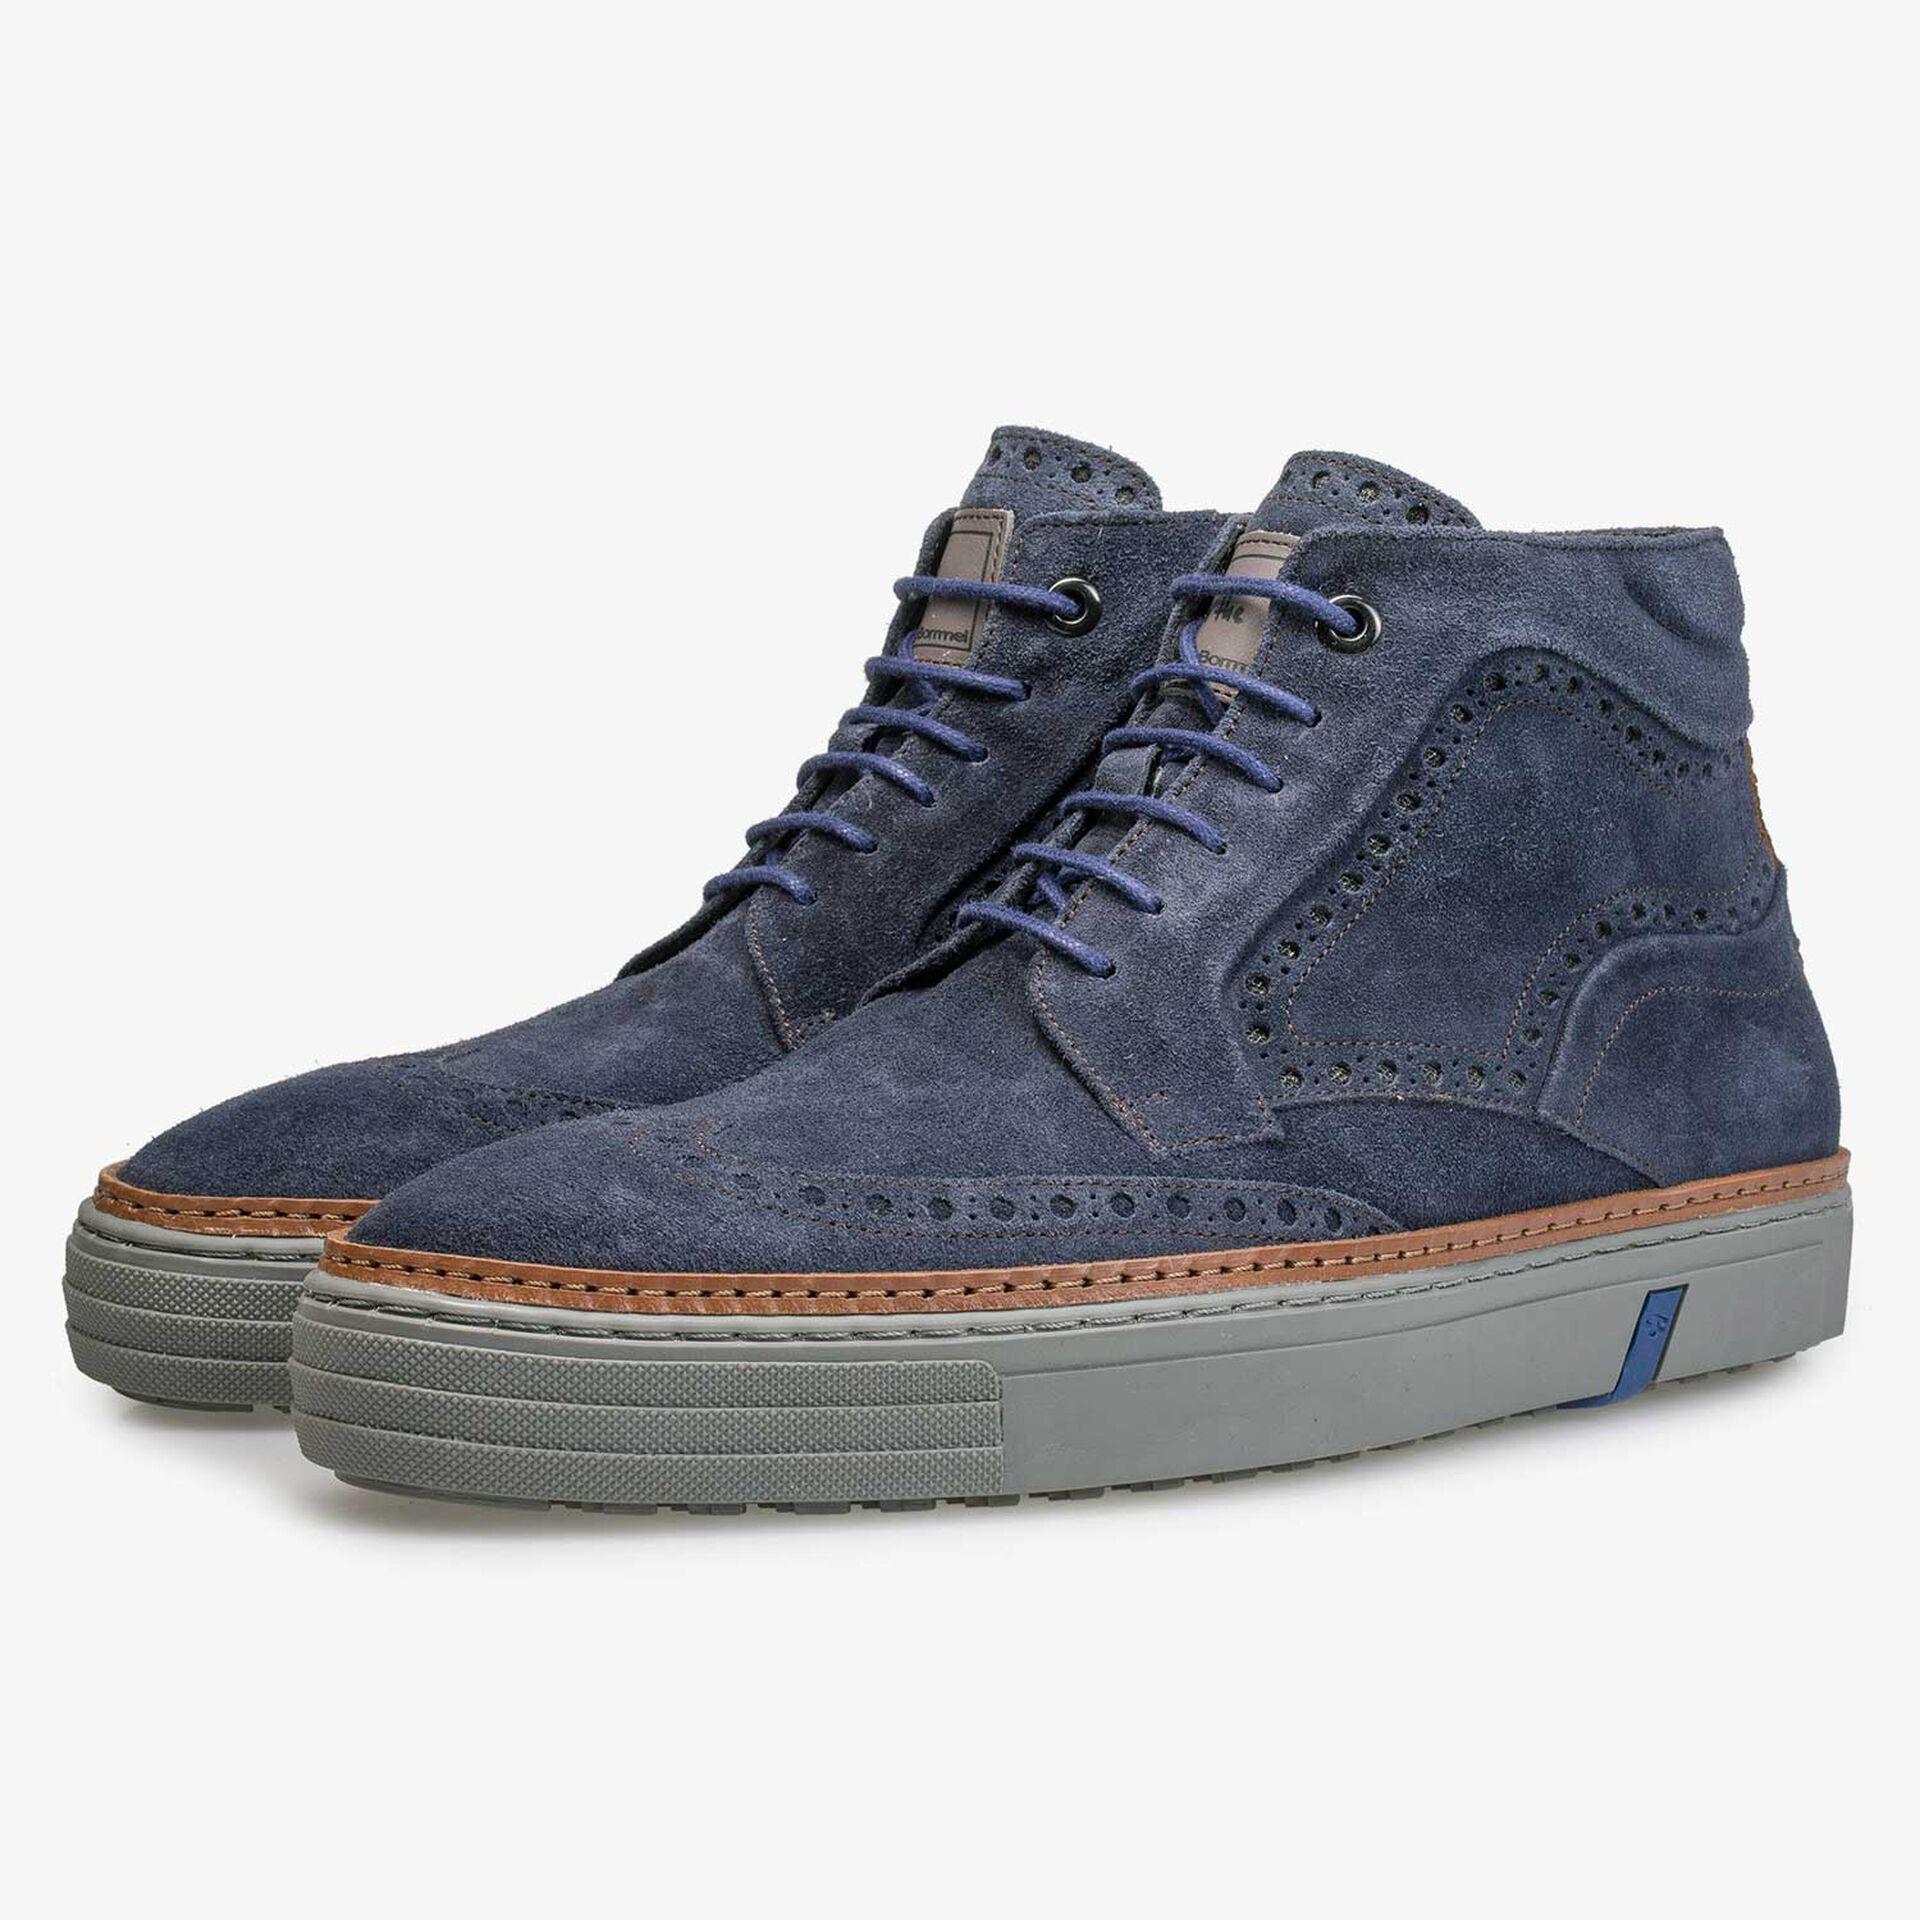 Blauwe brogue suède sneaker